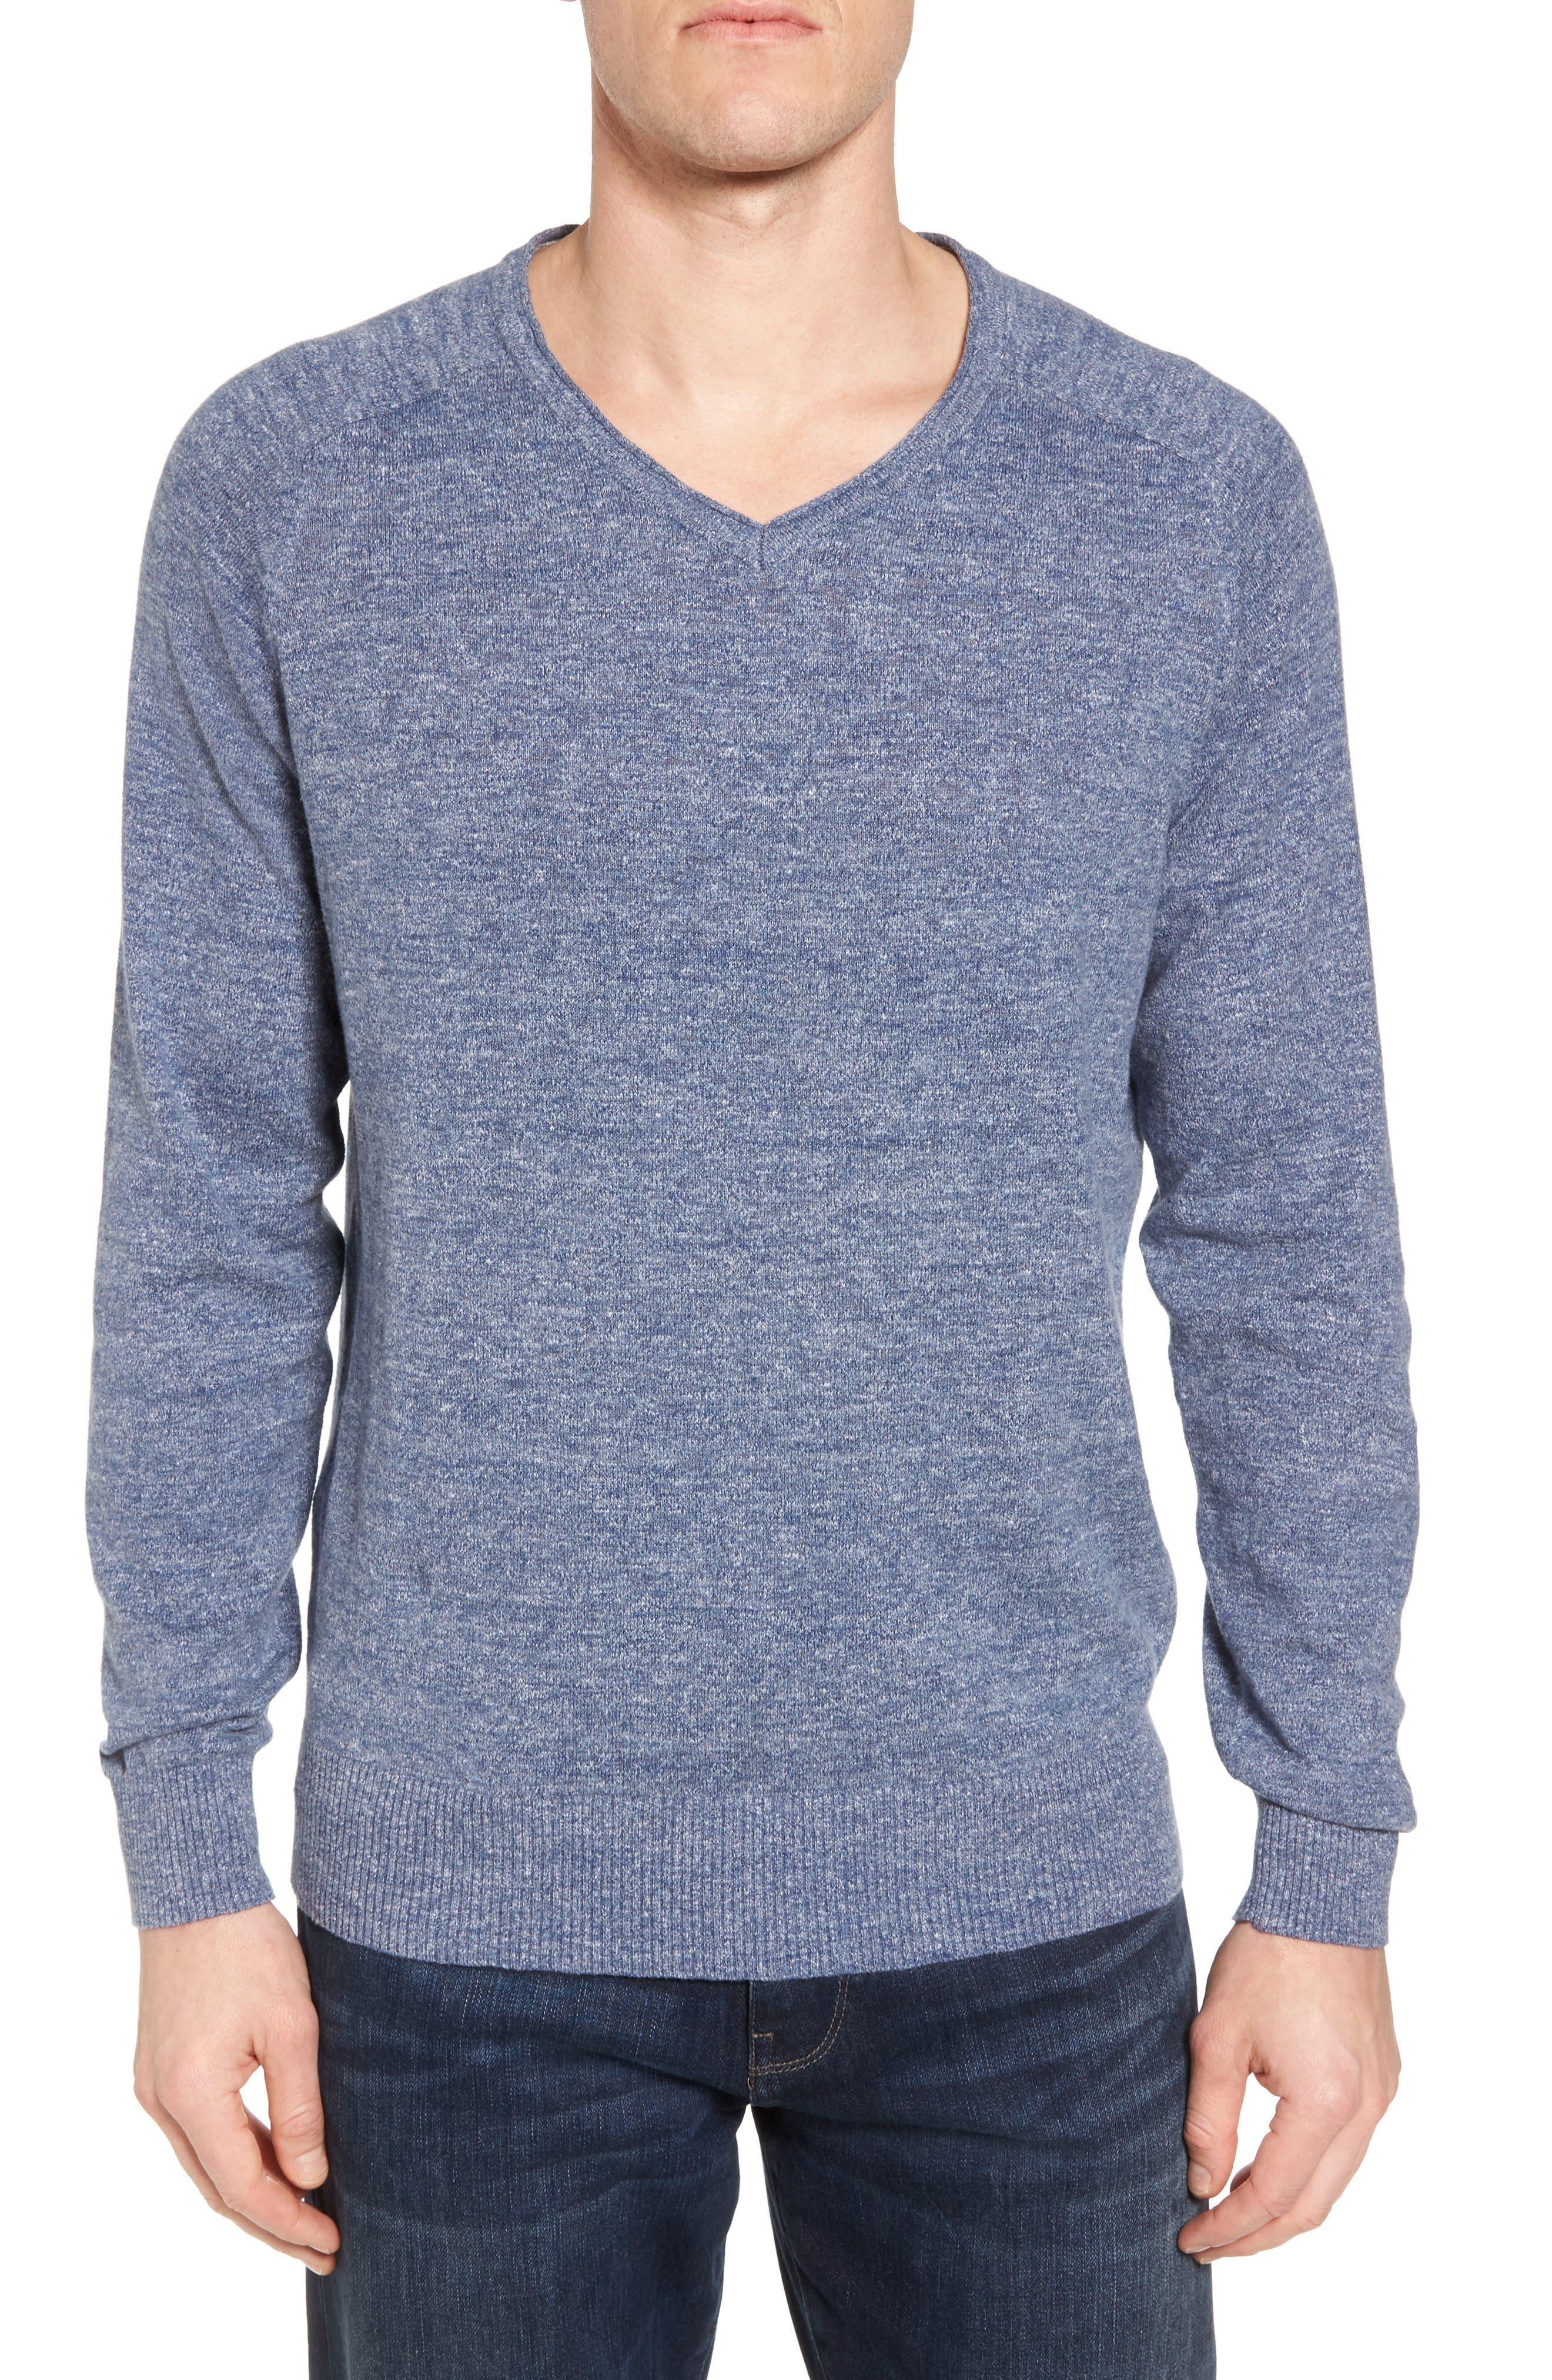 Arbors Cotton V-Neck Sweater,                         Main,                         color, Riviera